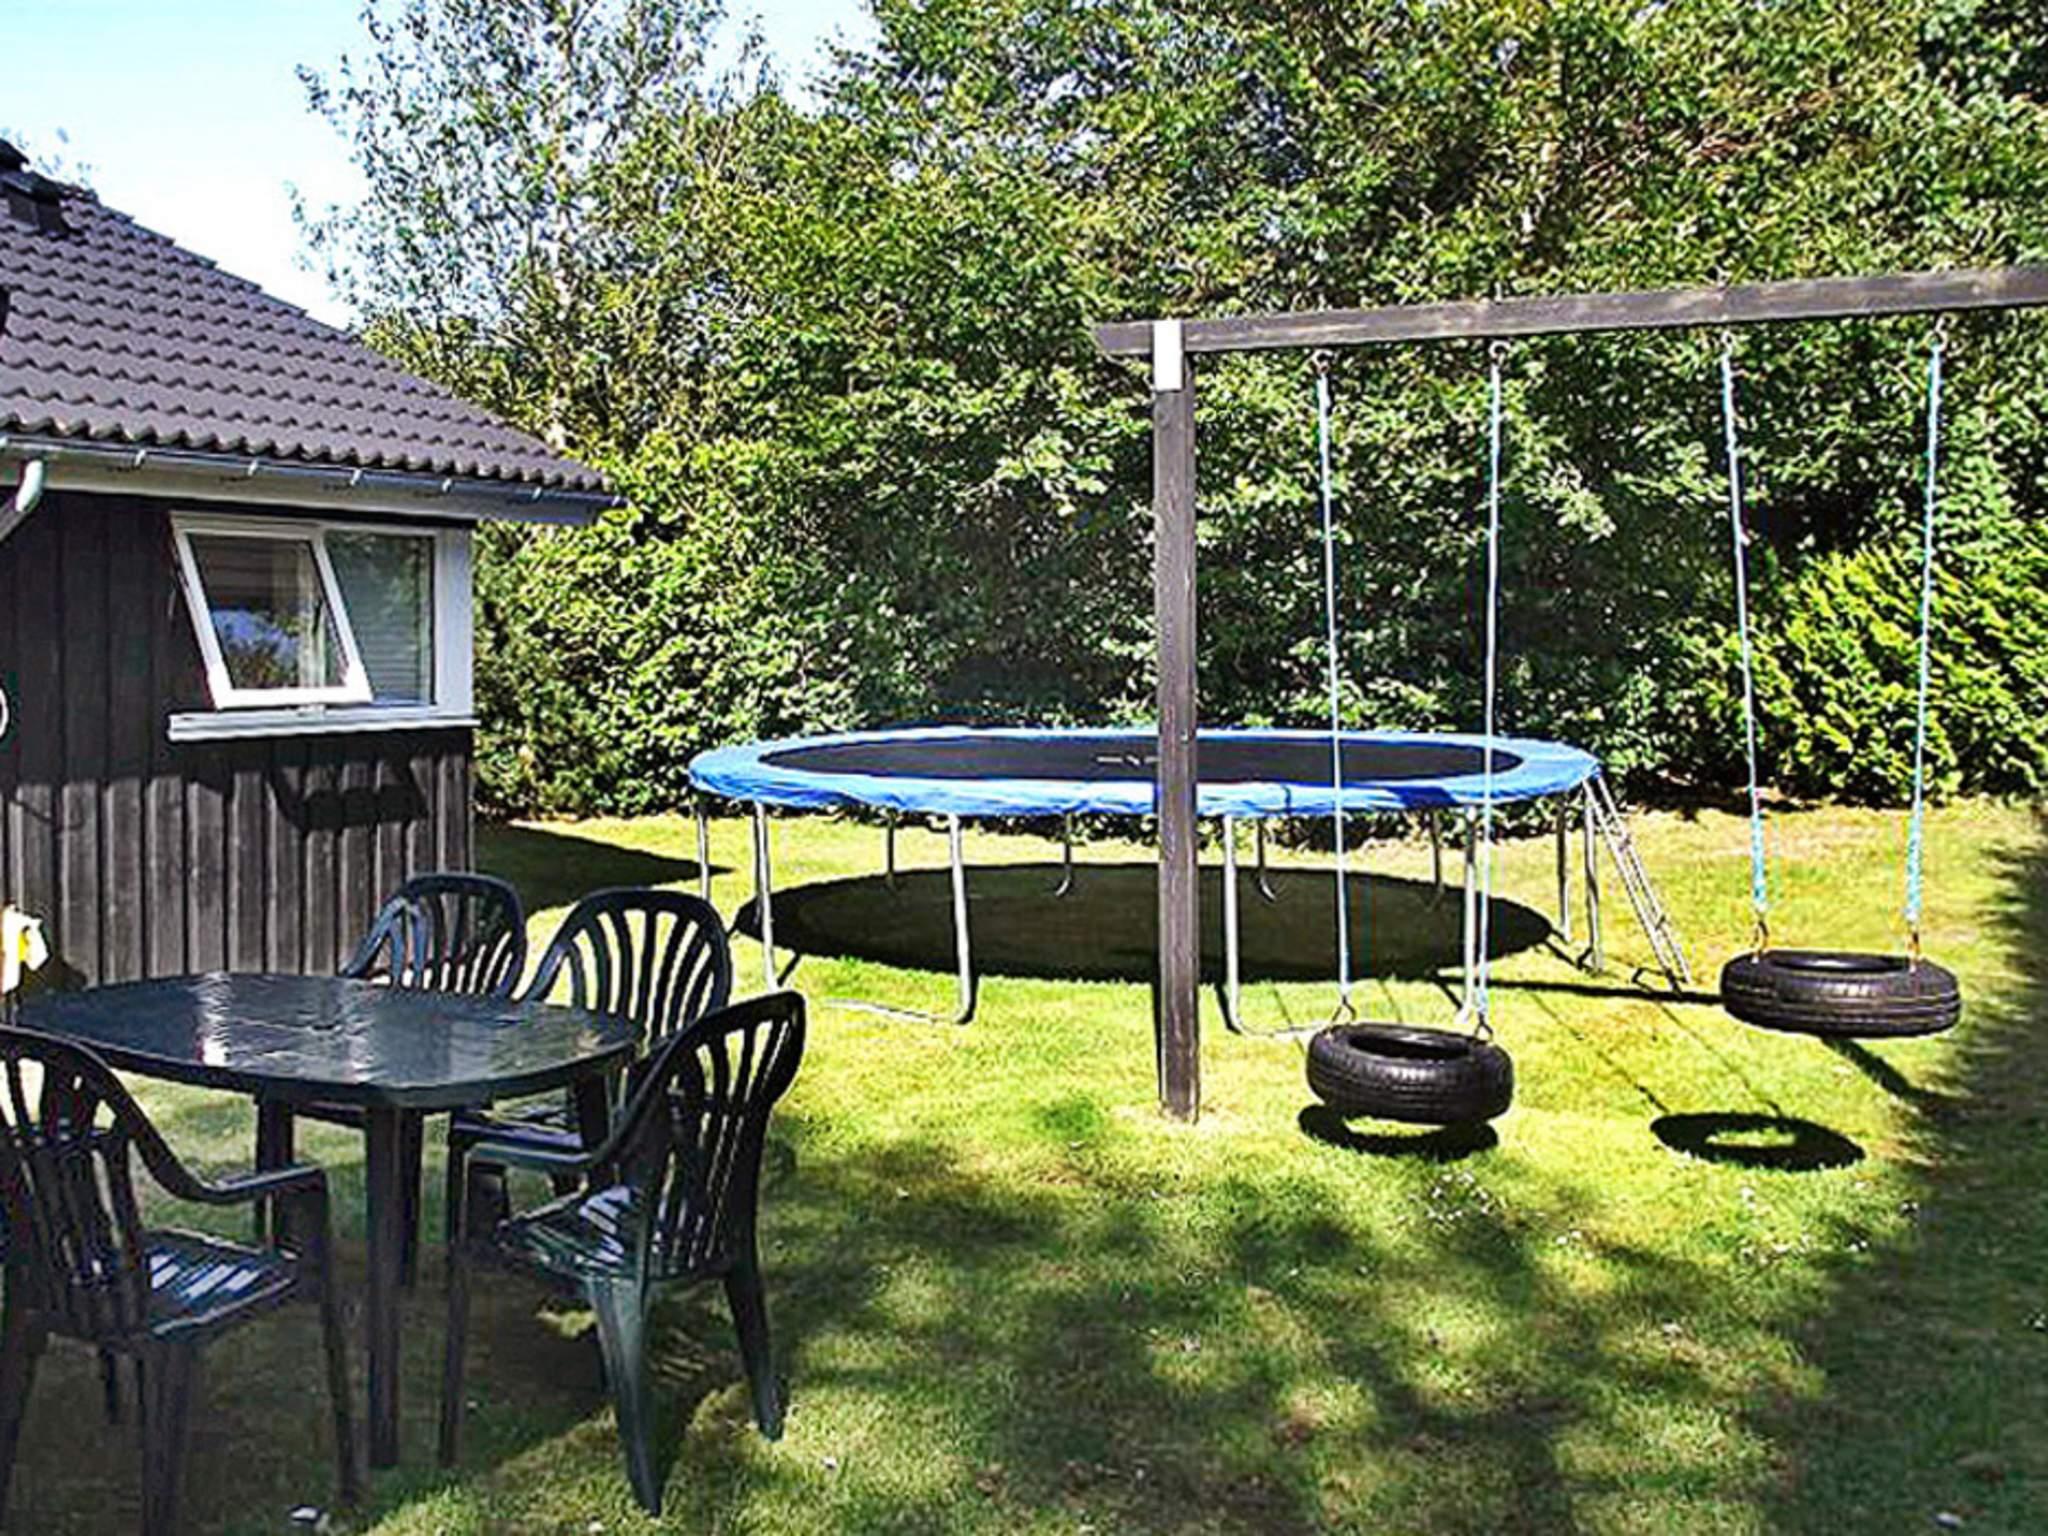 Ferienhaus Øster Hurup (1028934), Øster Hurup, , Ostjütland, Dänemark, Bild 15